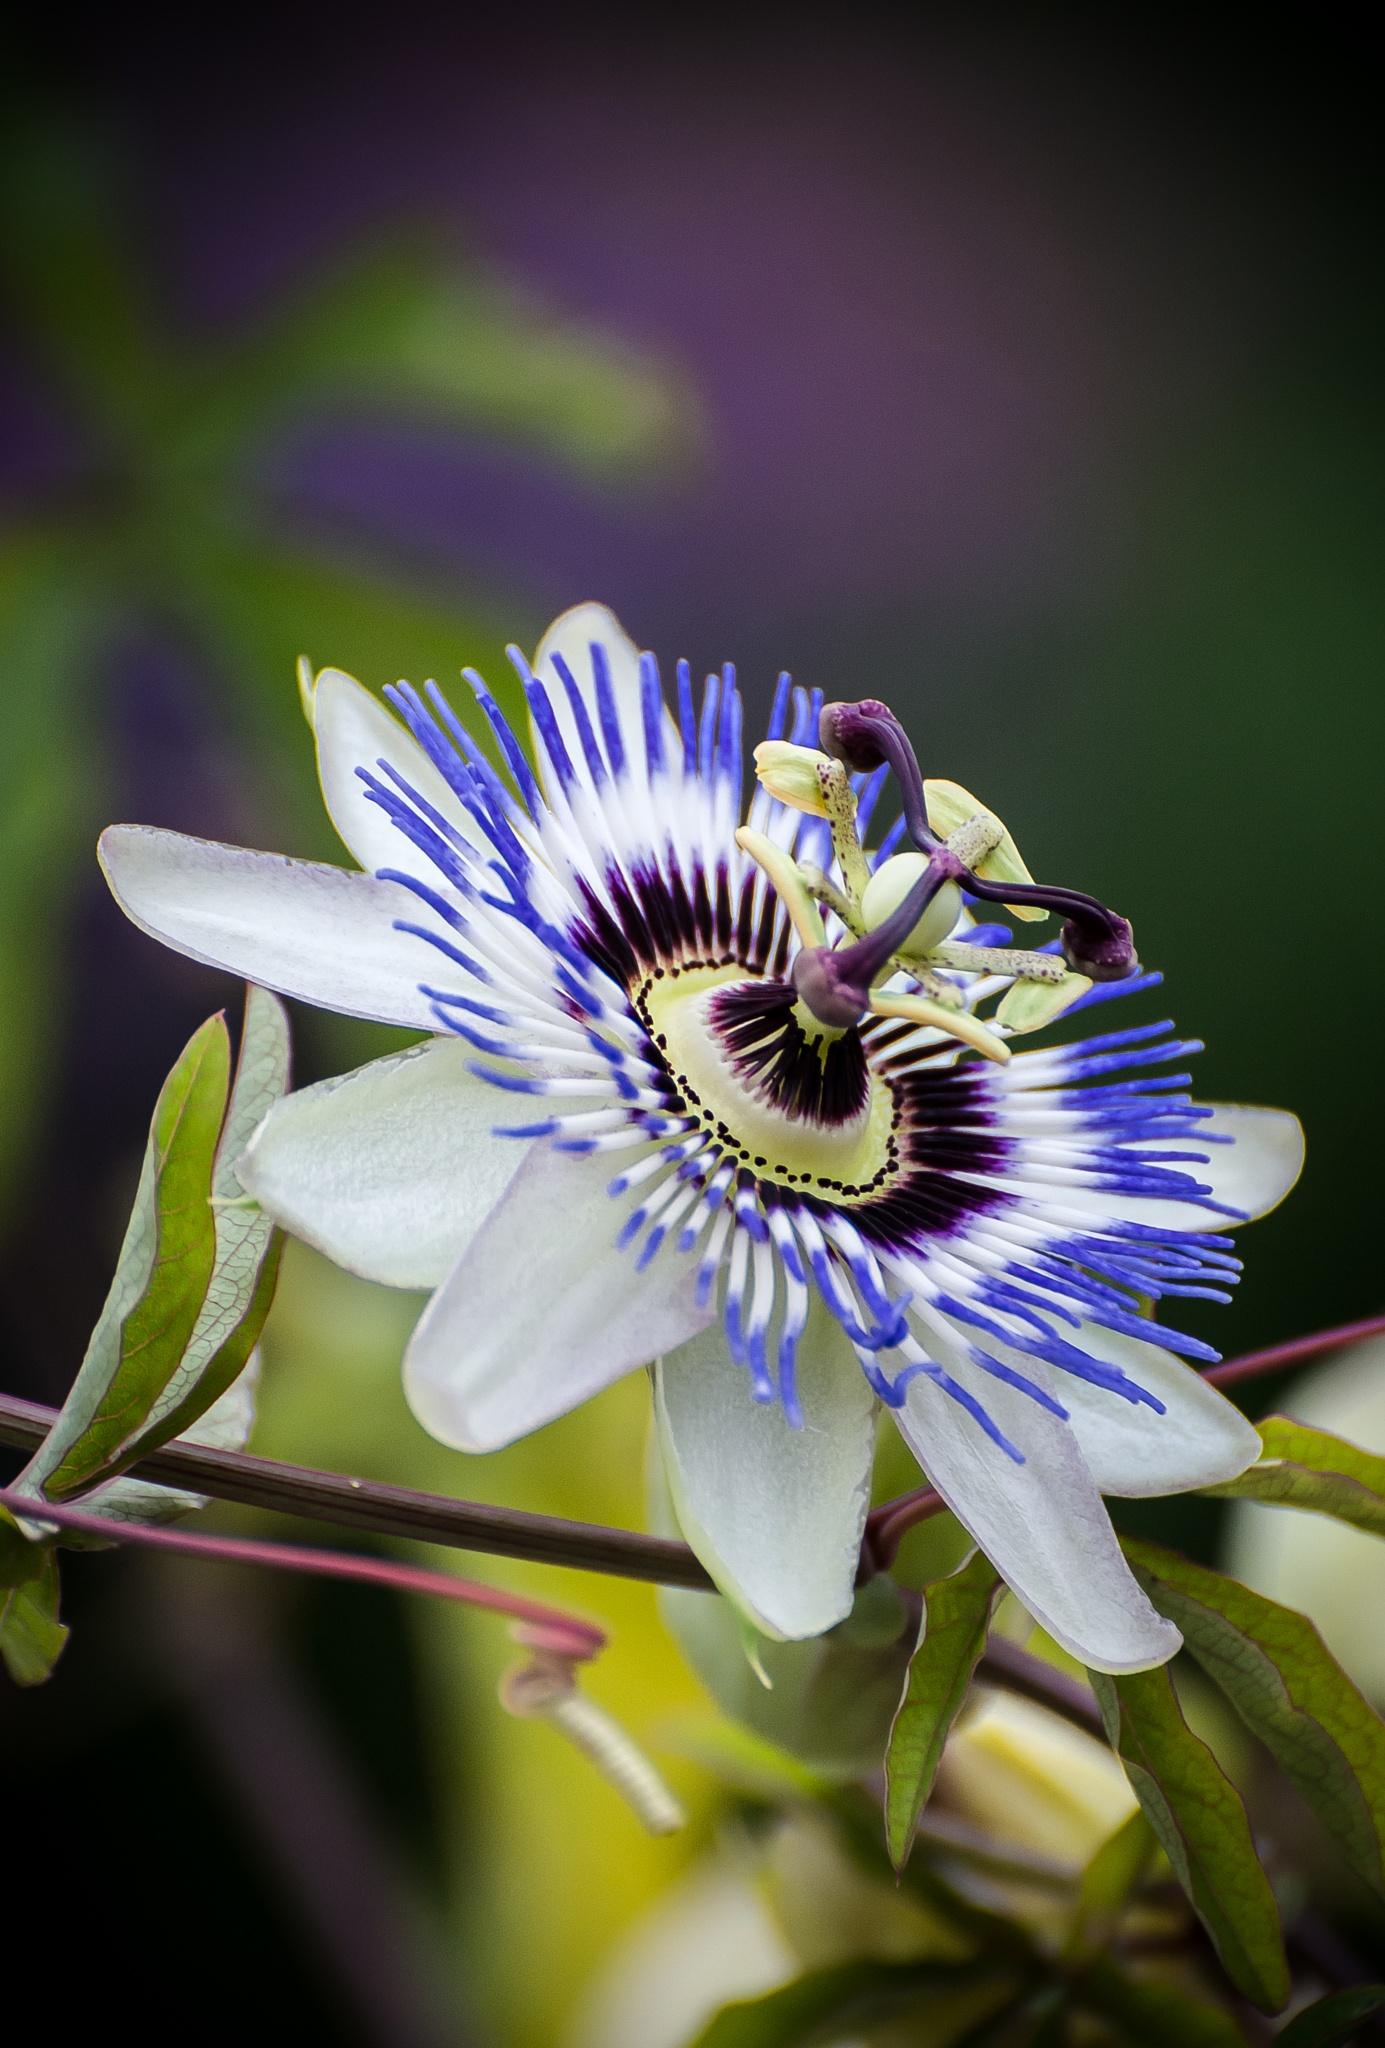 Blue passion flower / Passiflora caerulea by stoplamek